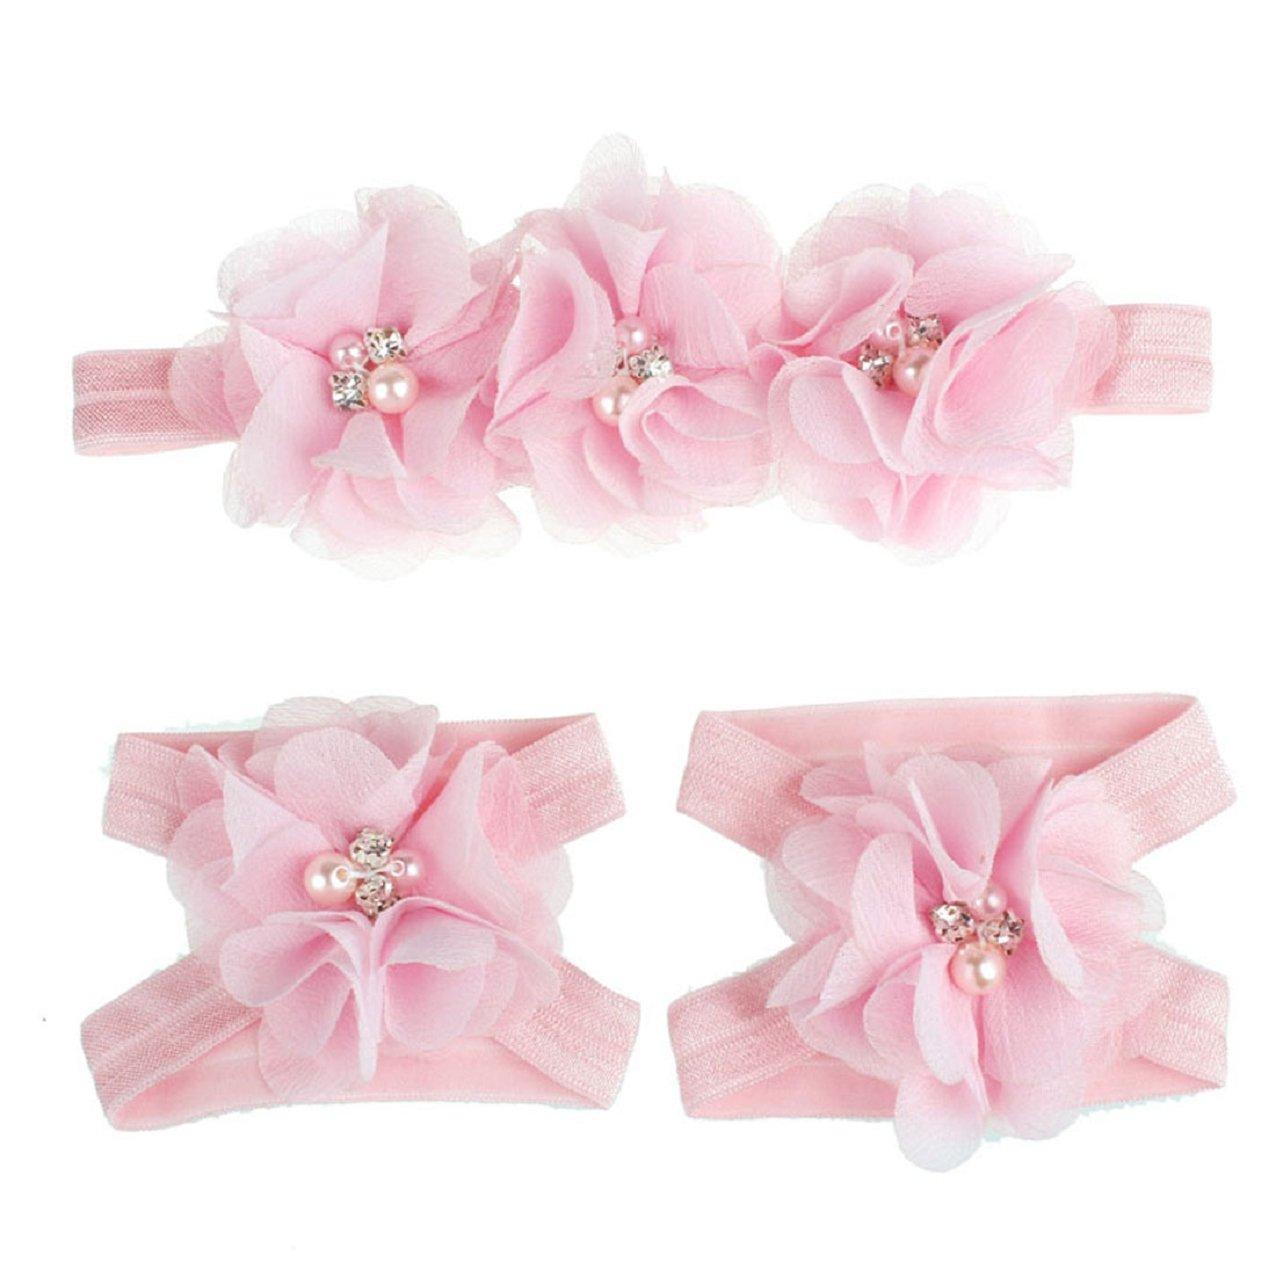 Headband Set for Baby Infants Girls Foot Flower Barefoot Sandals